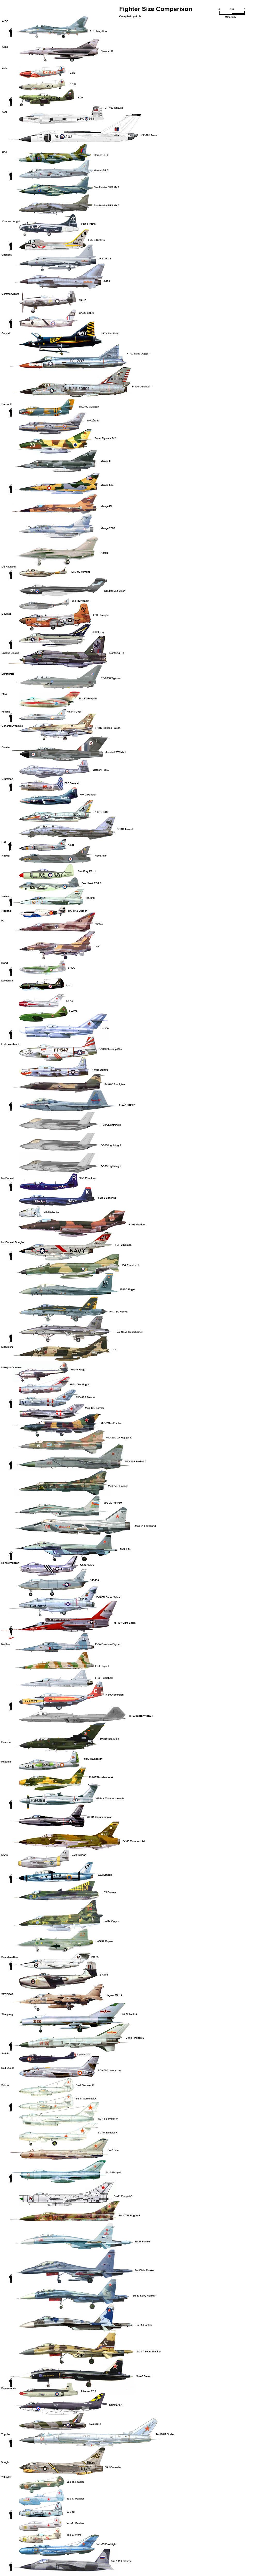 comparatif-taille-avion.jpg